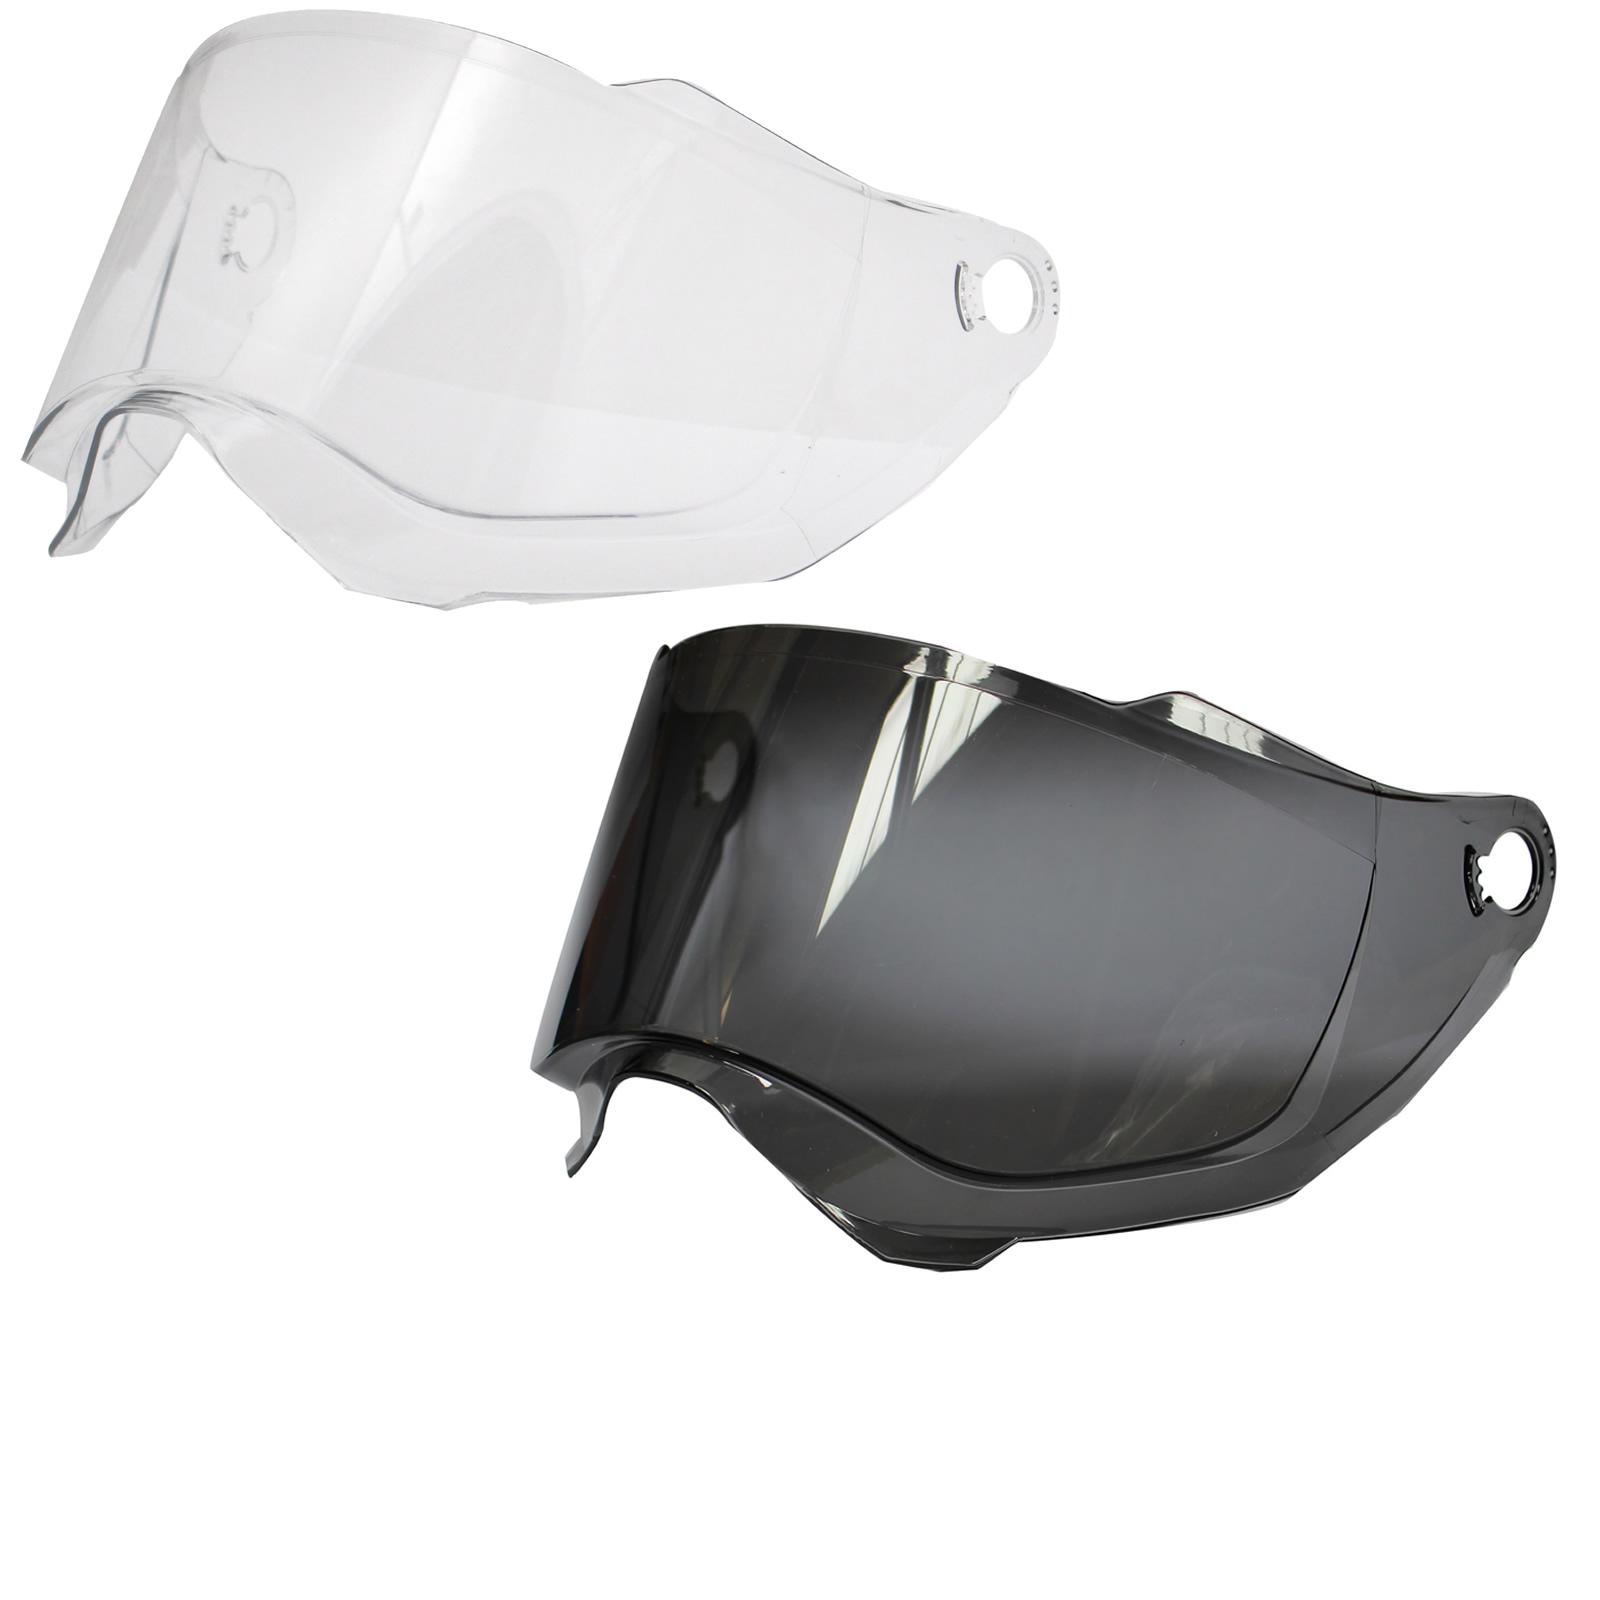 thh tx 13 sheild visor moto scooter couleur claire teint casque cran visi re. Black Bedroom Furniture Sets. Home Design Ideas